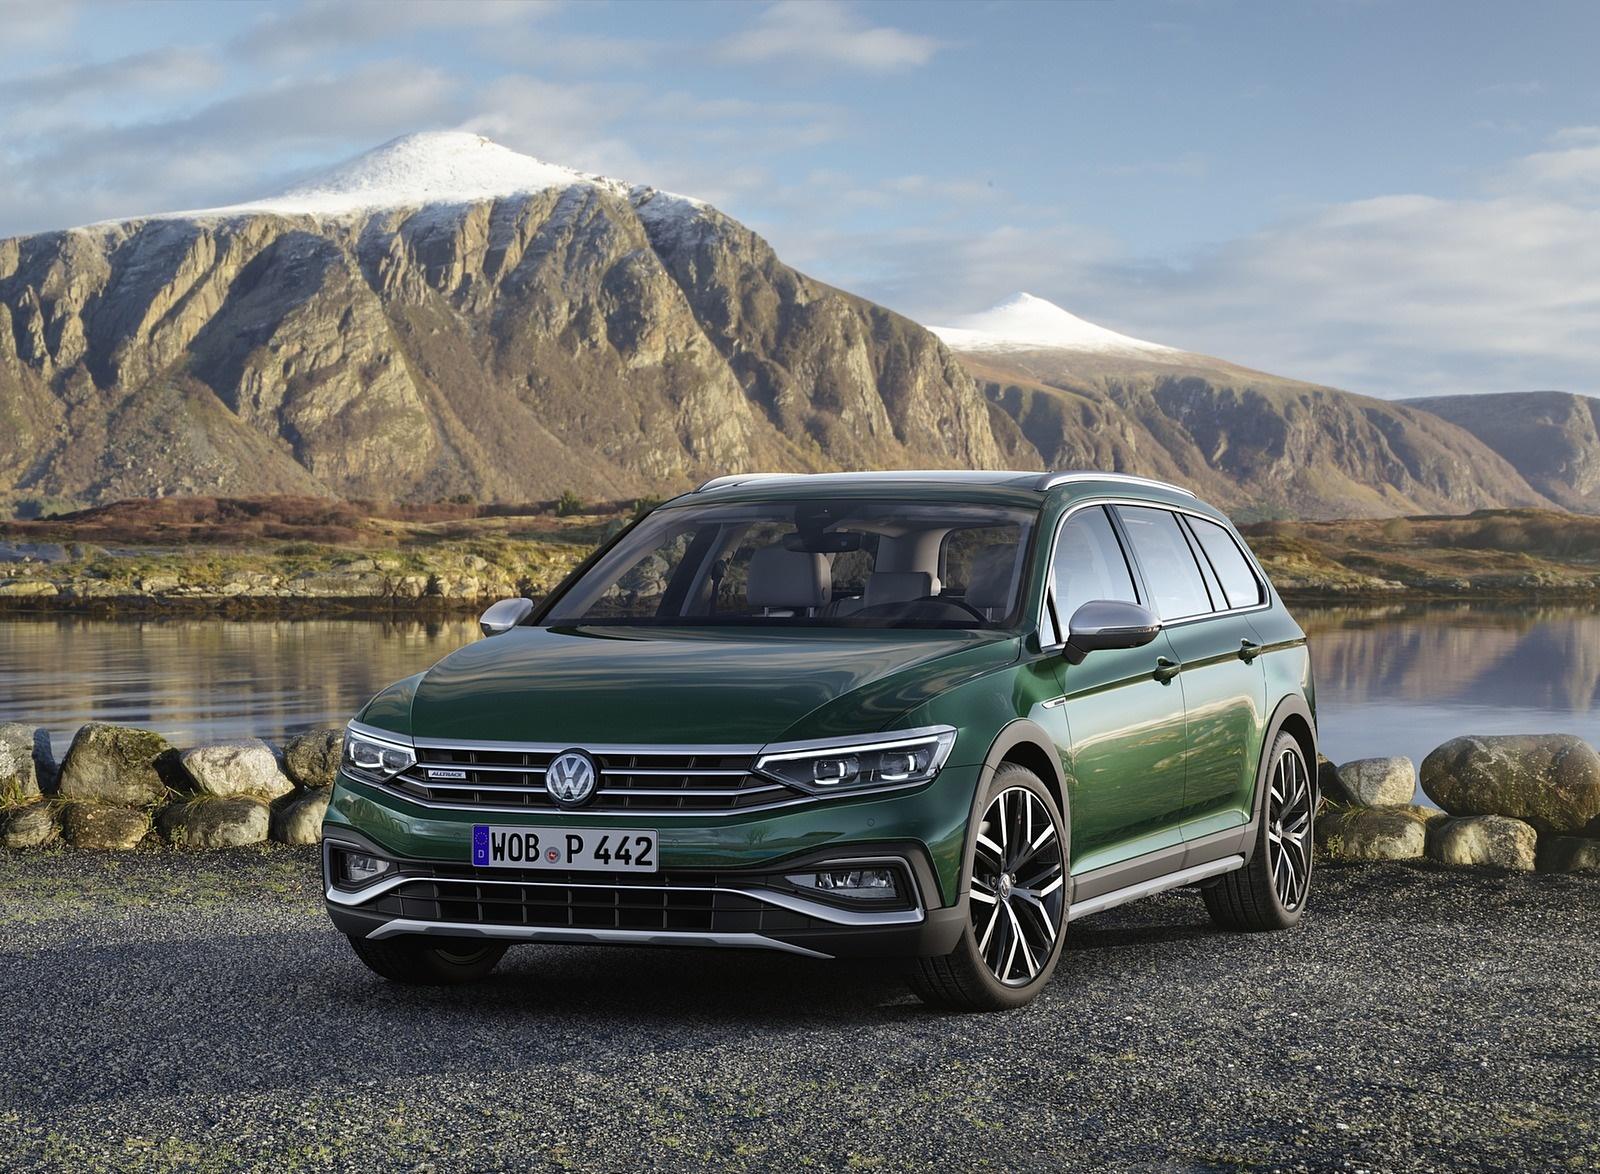 2020 Volkswagen Passat Alltrack (EU-Spec) Front Three-Quarter Wallpapers (5)